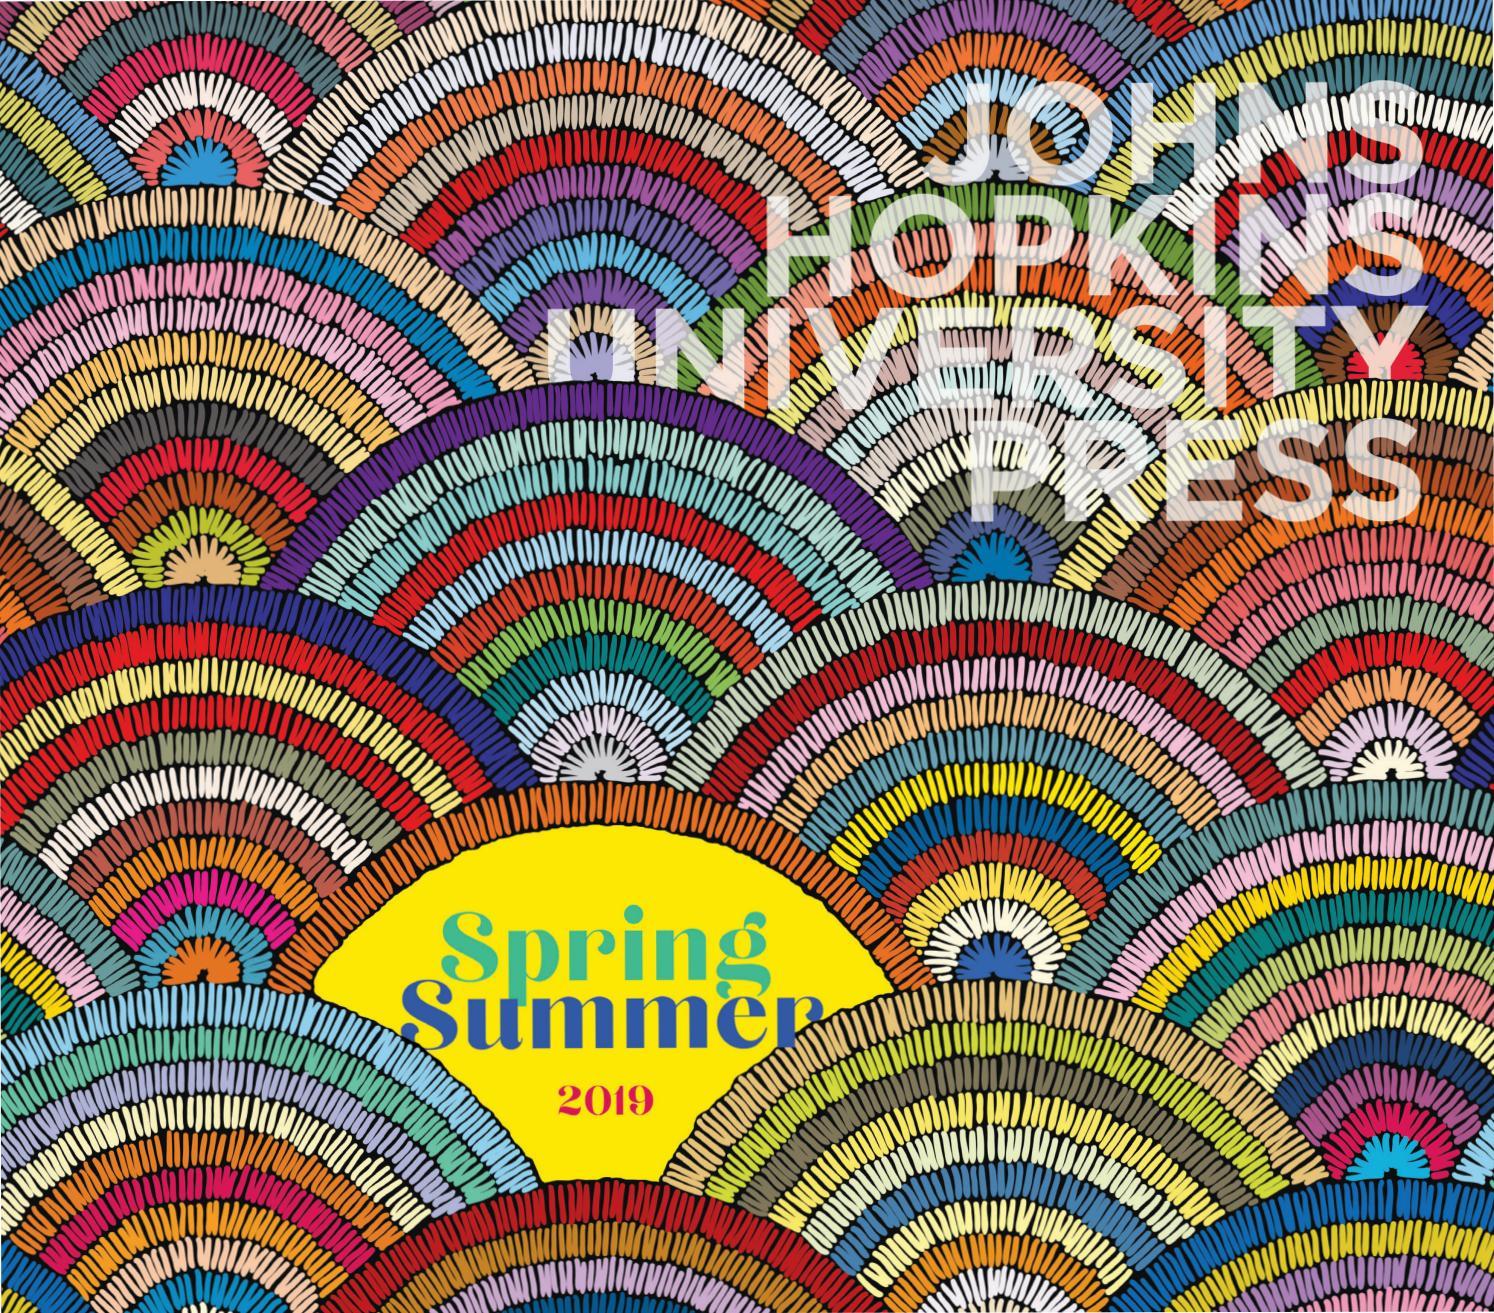 Johns Hopkins University Press Spring 2019 Catalog by Susan Ventura